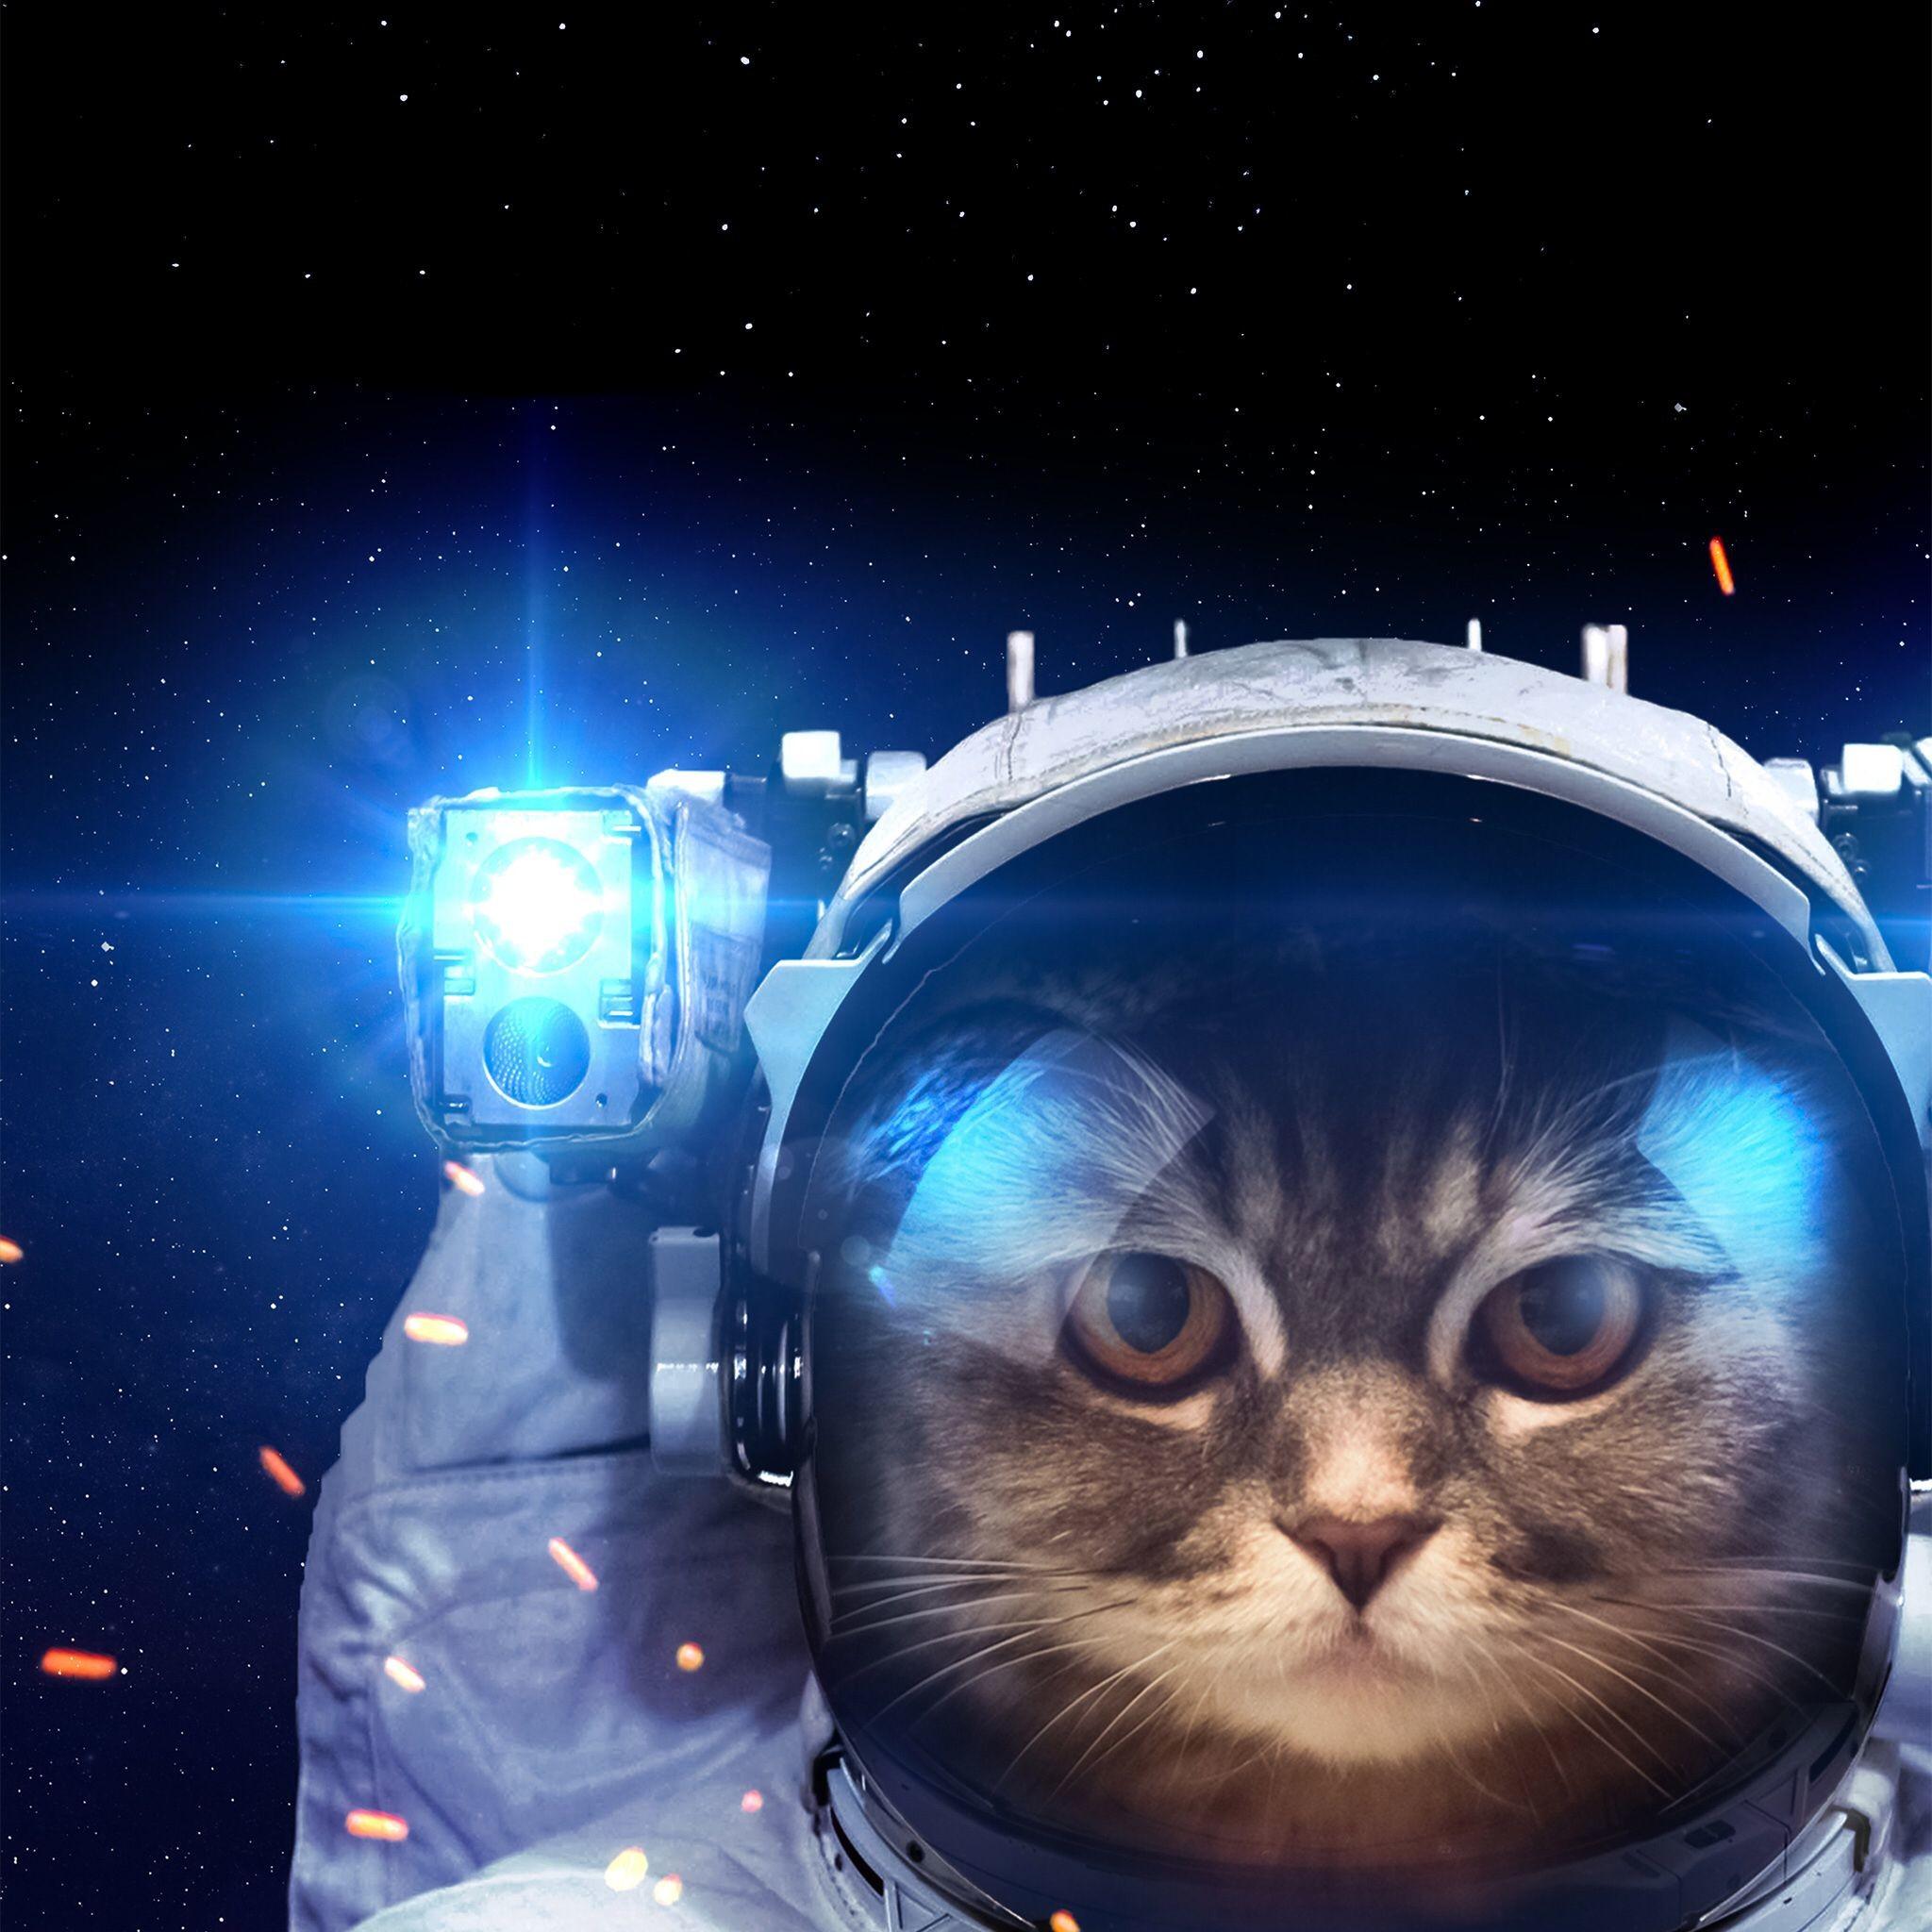 Res: 2048x2048, Explore Space Cat, Cat Wallpaper, and more!